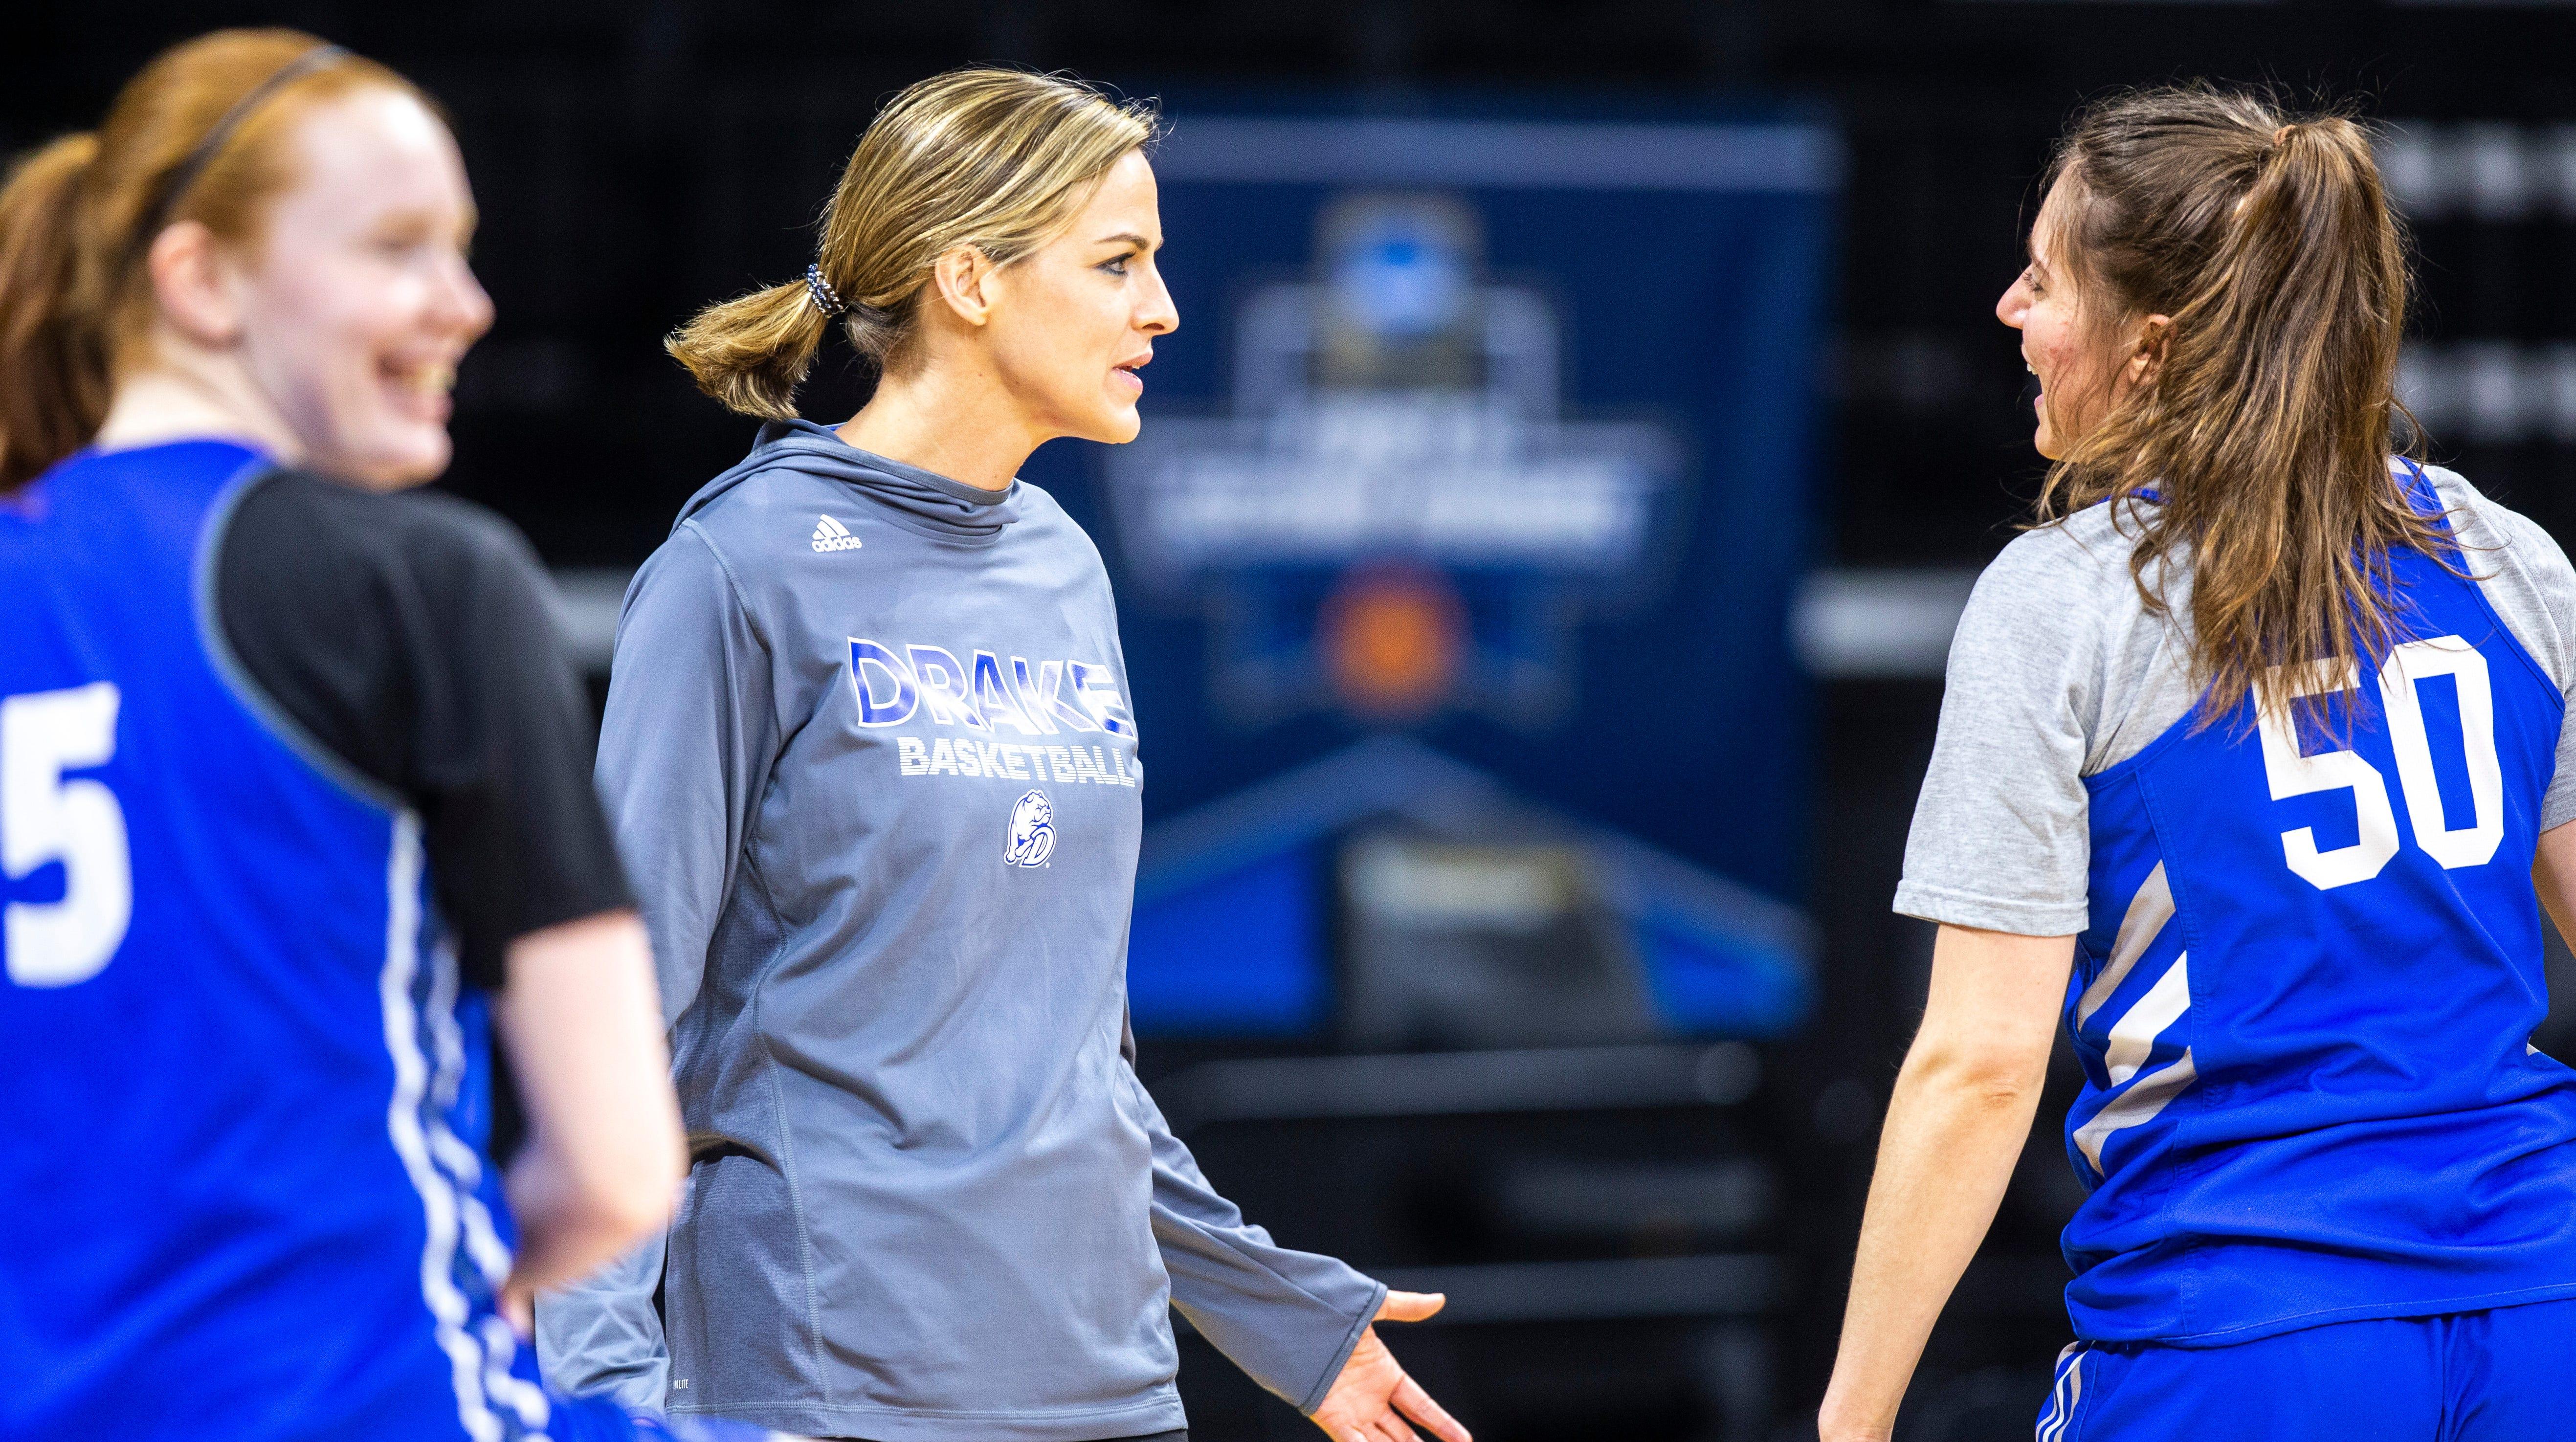 Drake women's basketball first-round practice day in Iowa City